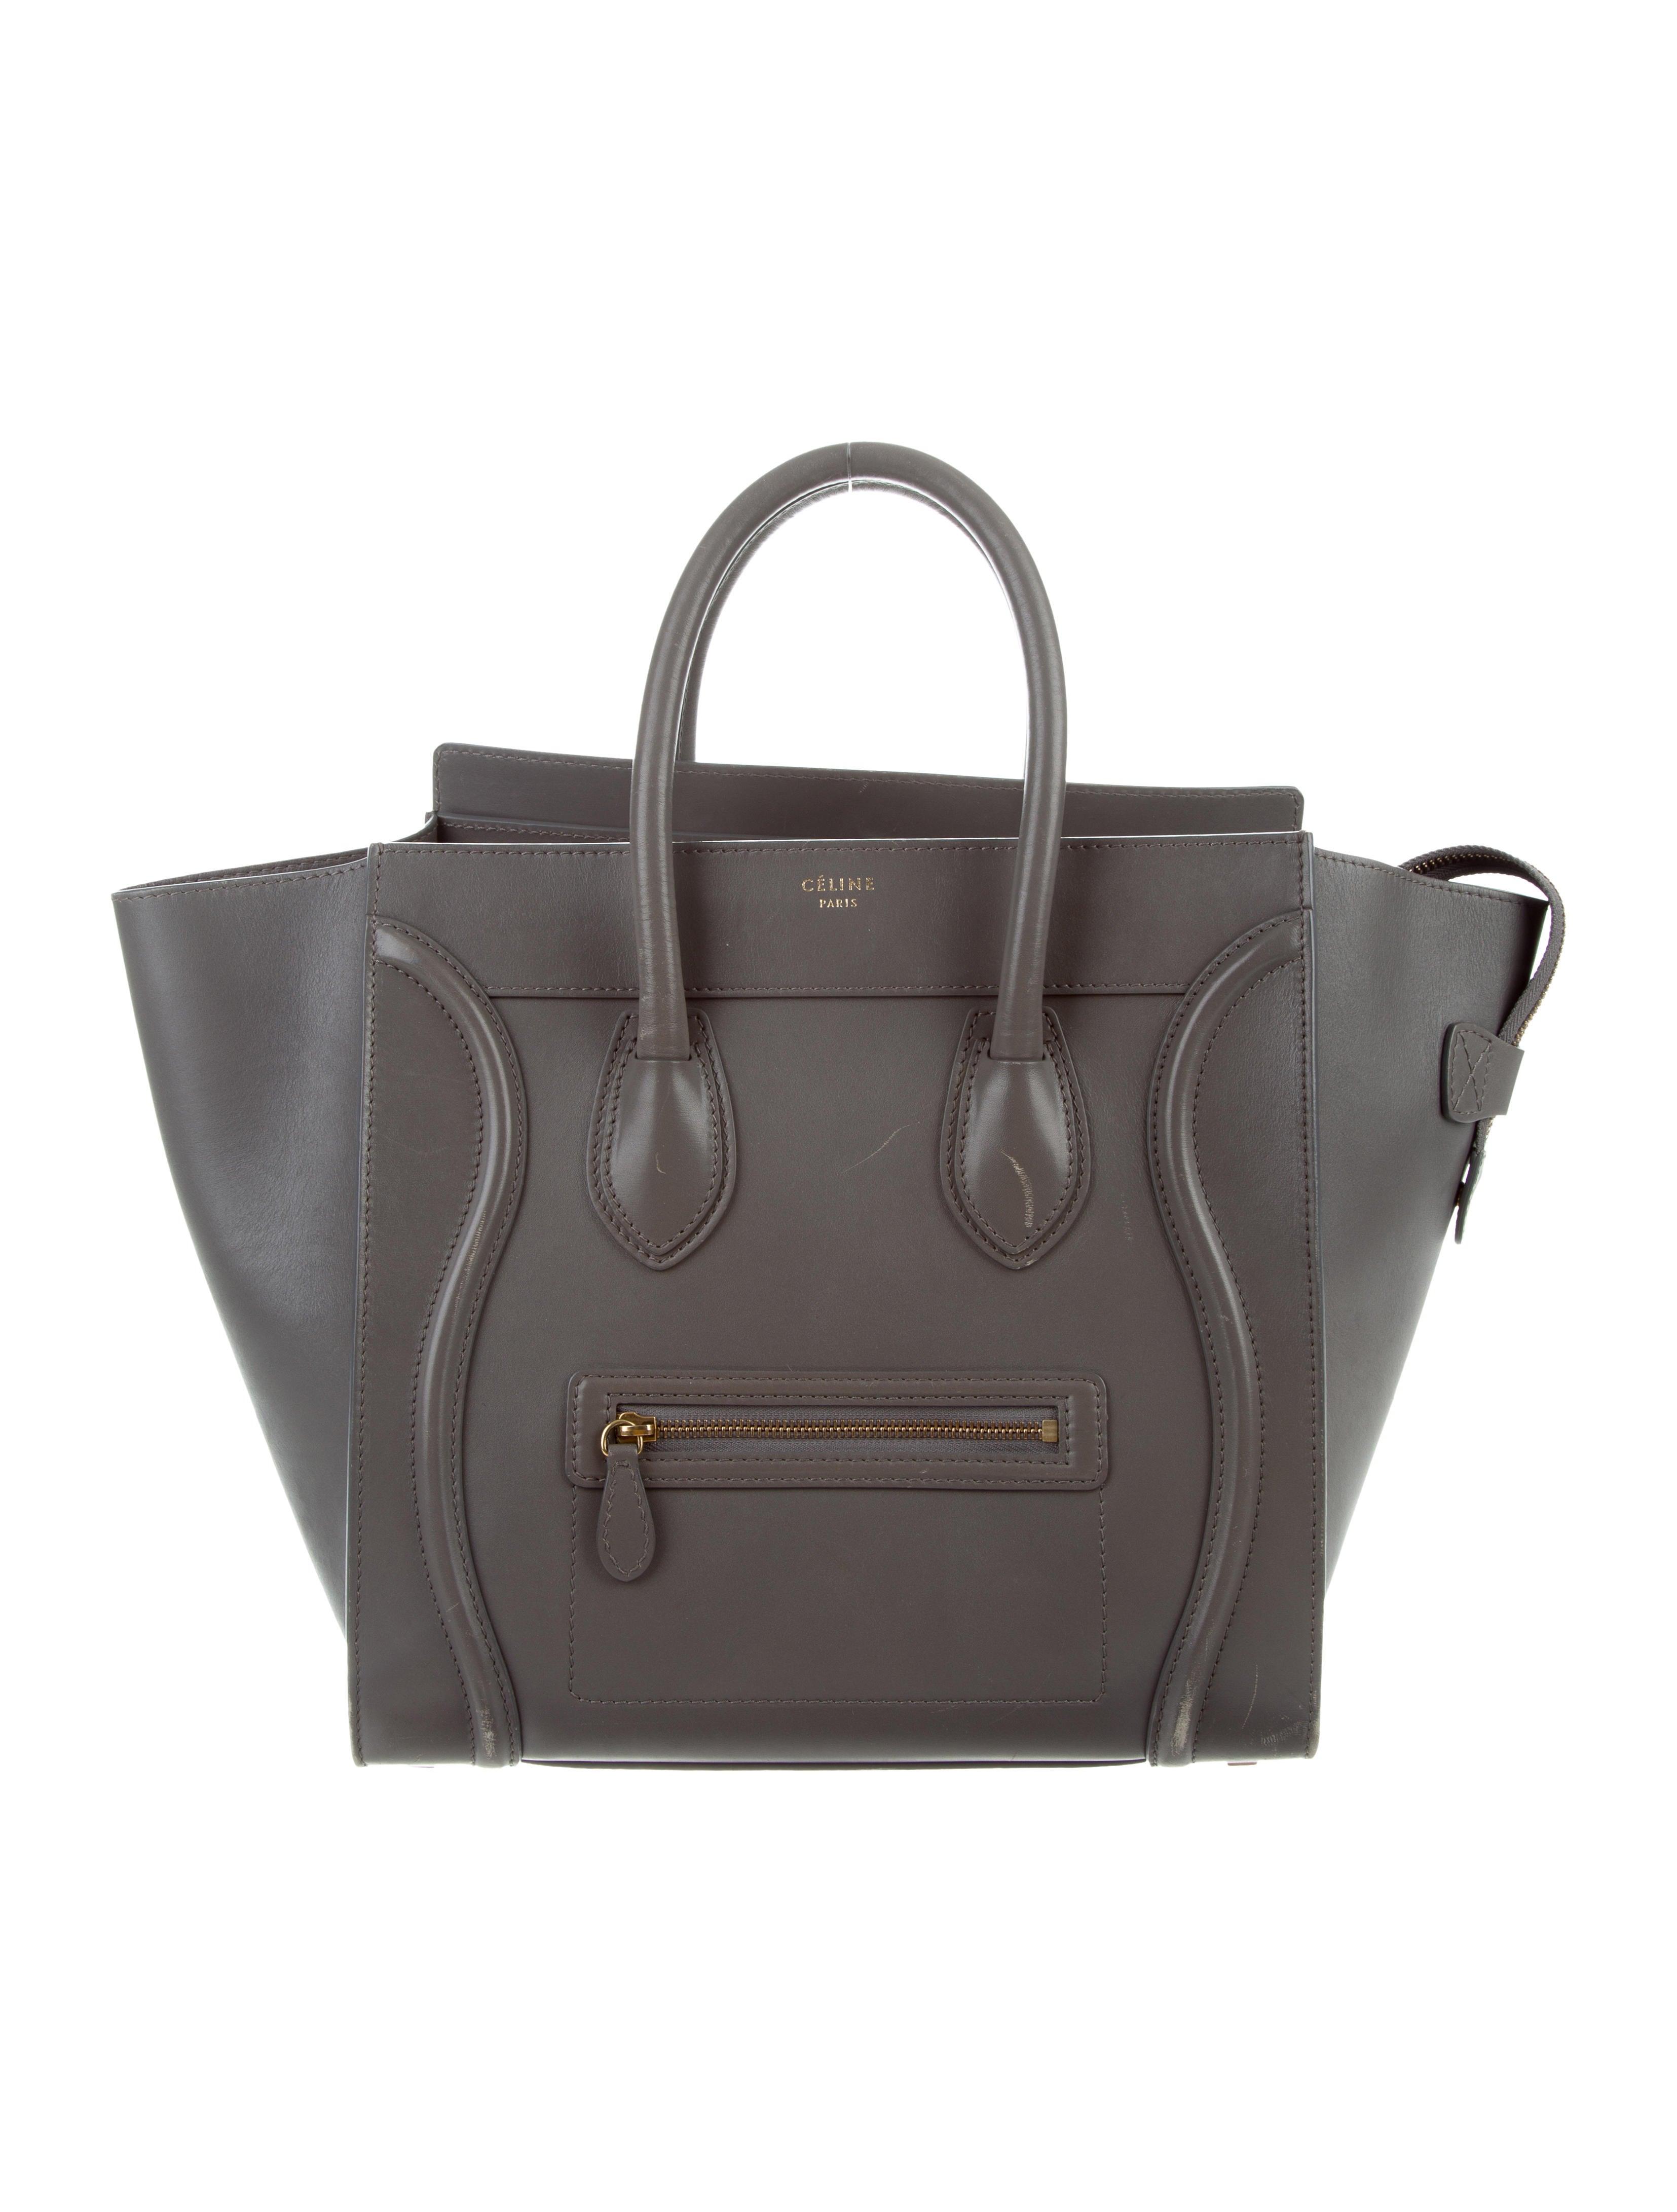 10cbd3b2bcd4 Celine Handbags